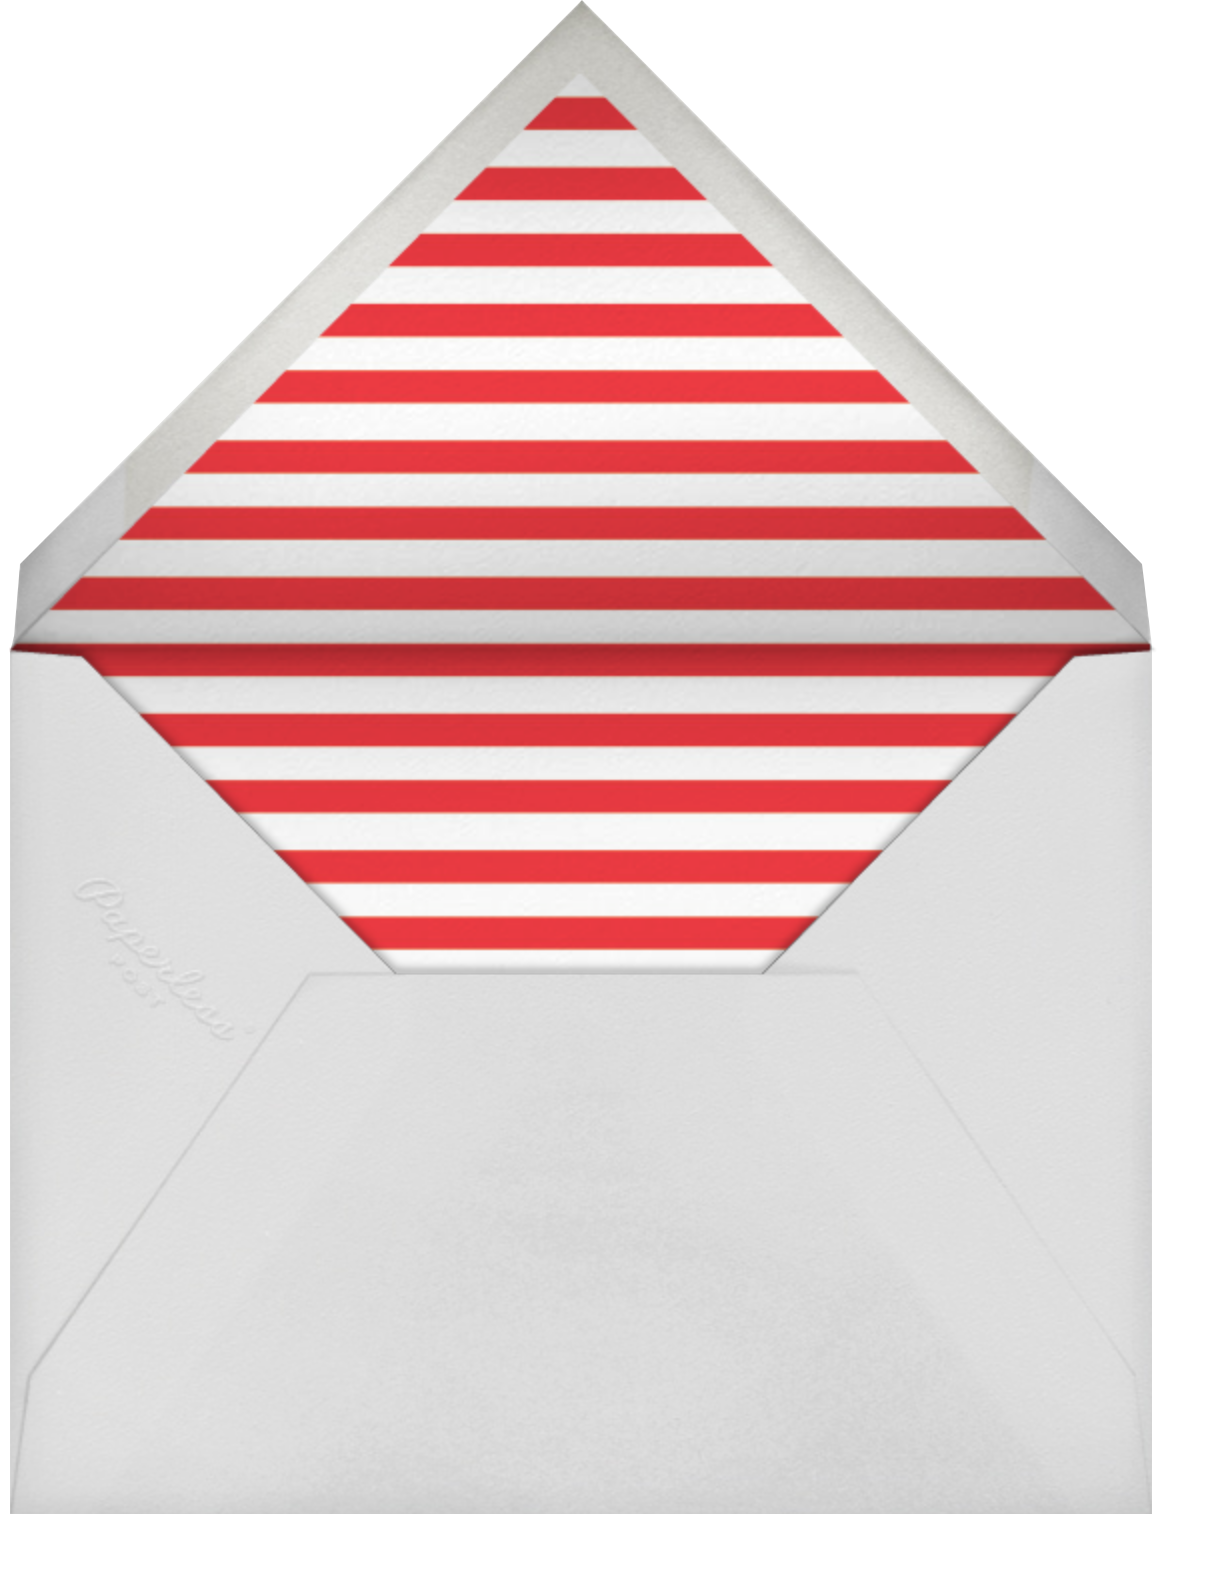 Your Teeth Will Rot (Purim) - Mr. Boddington's Studio - Purim - envelope back